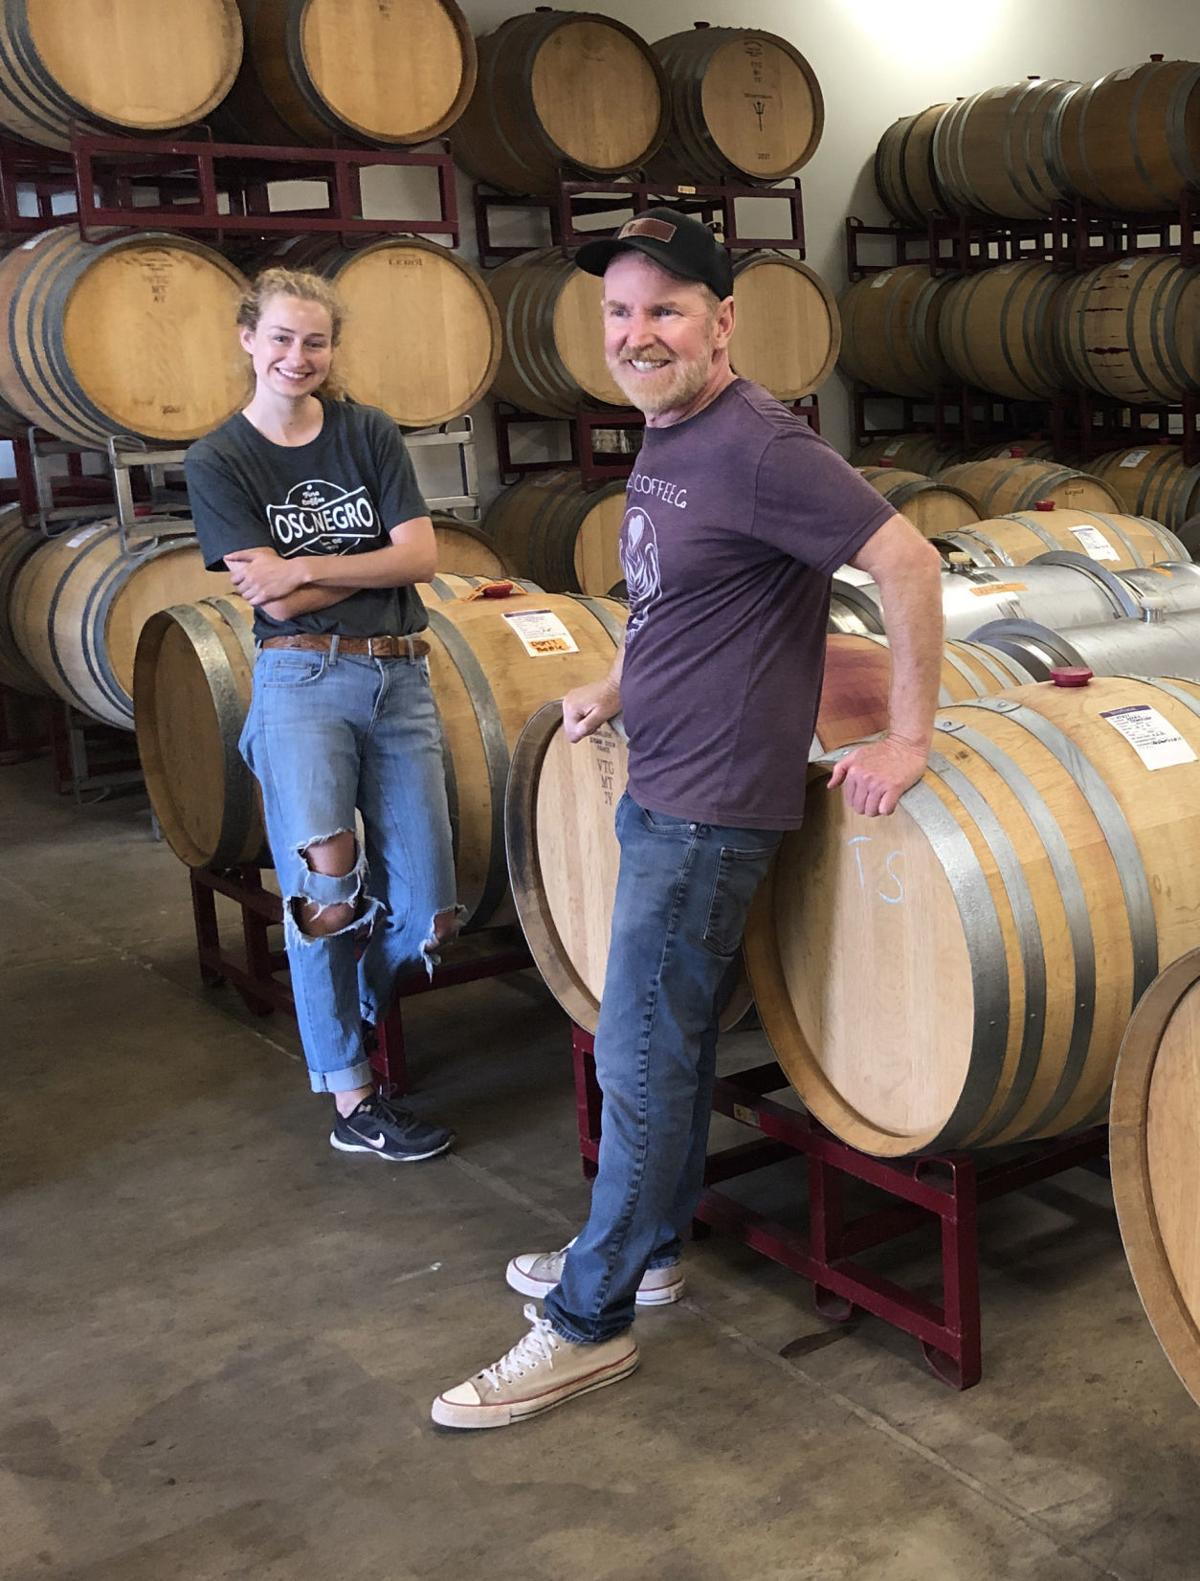 051820 Montemar Winery 16